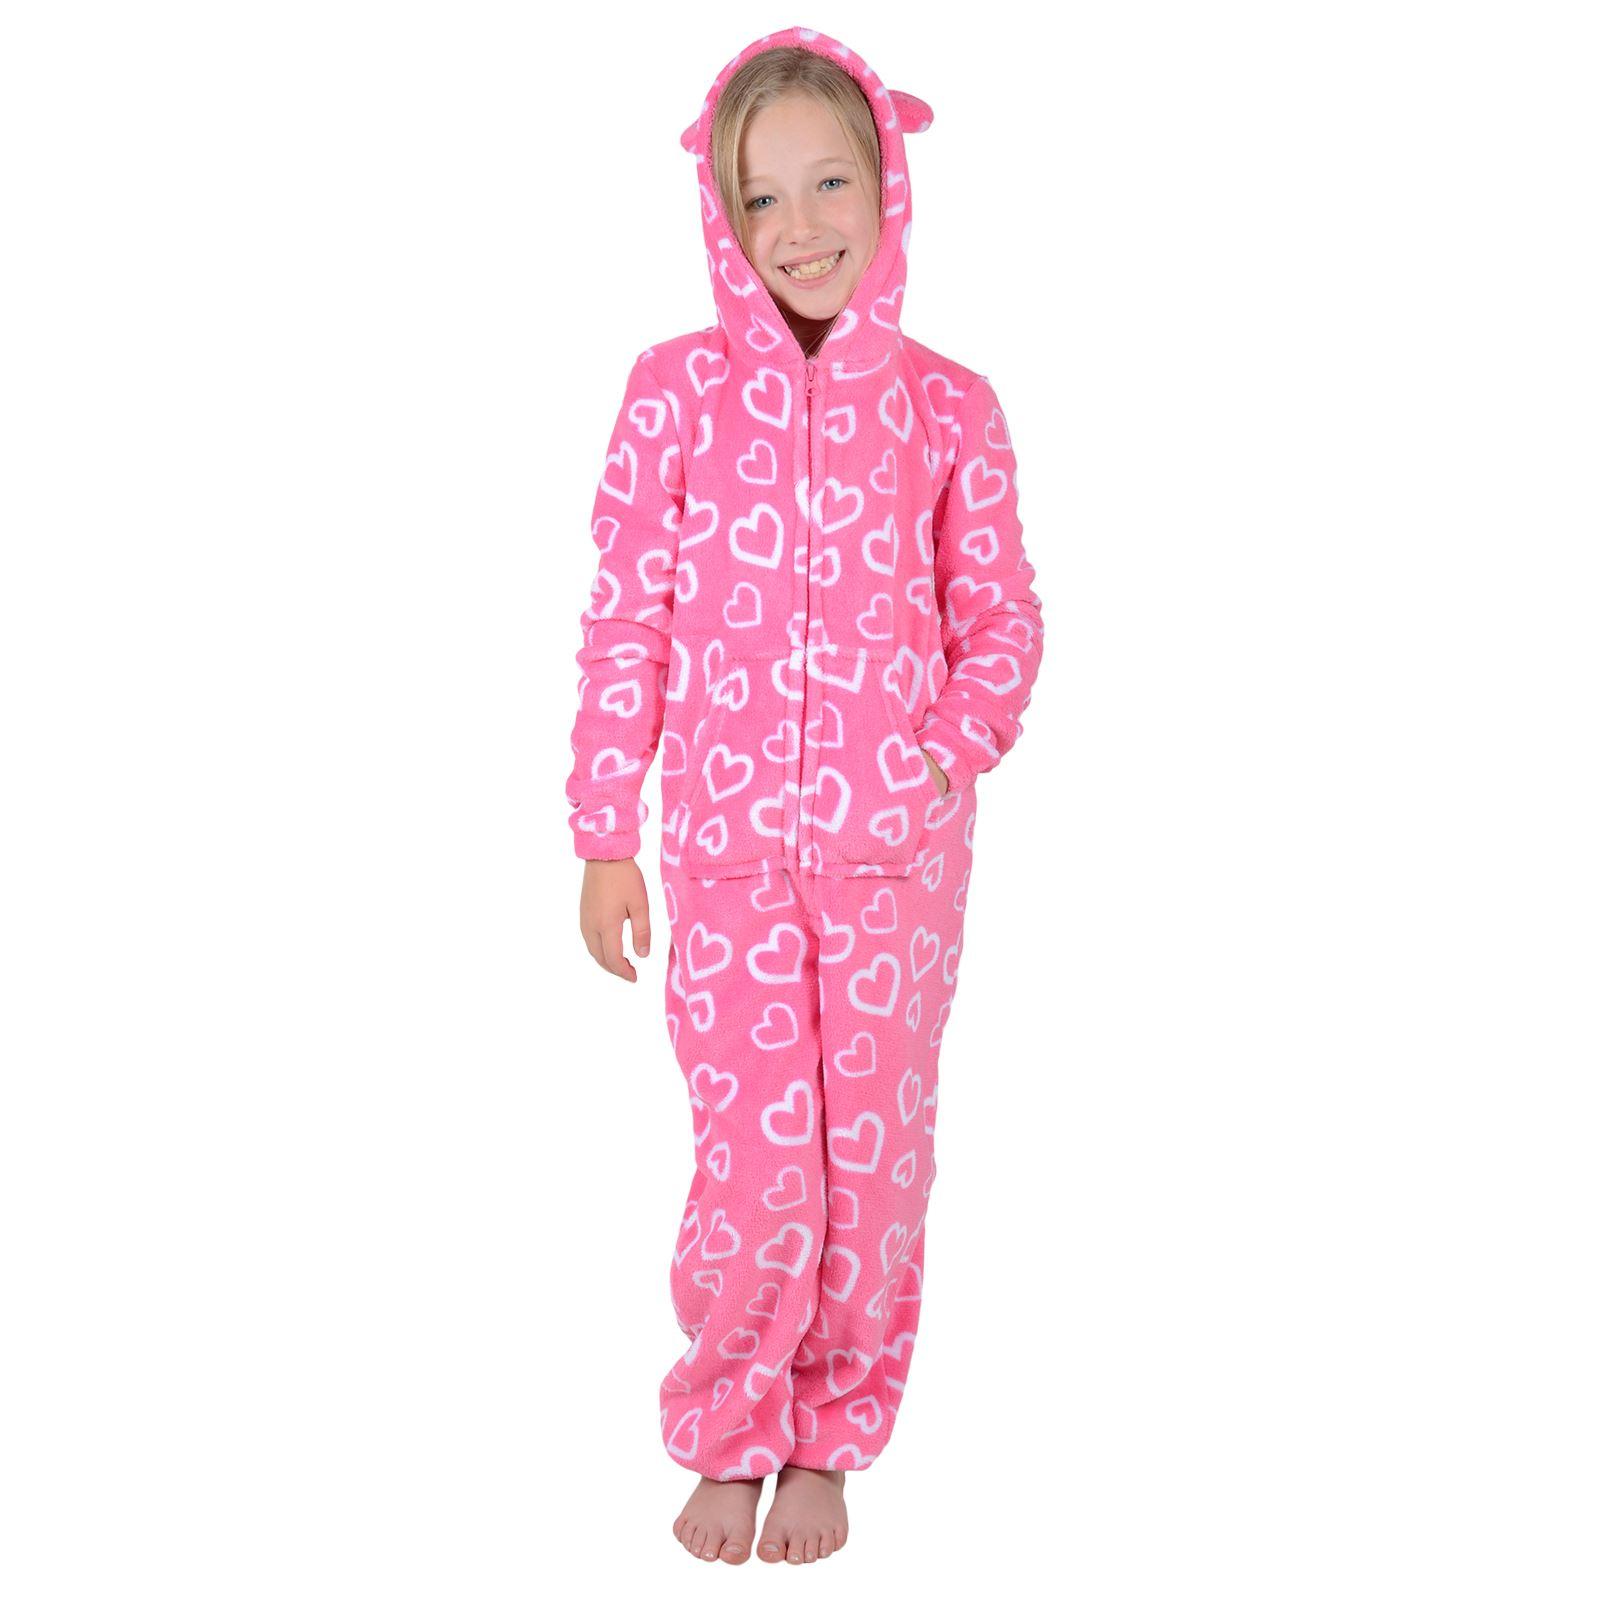 Roaster Toaster Girls Hooded Fleece All In One Piece Pyjamas Jump Sleep Suit  Onesie PJ Nightwear 973ada0a1